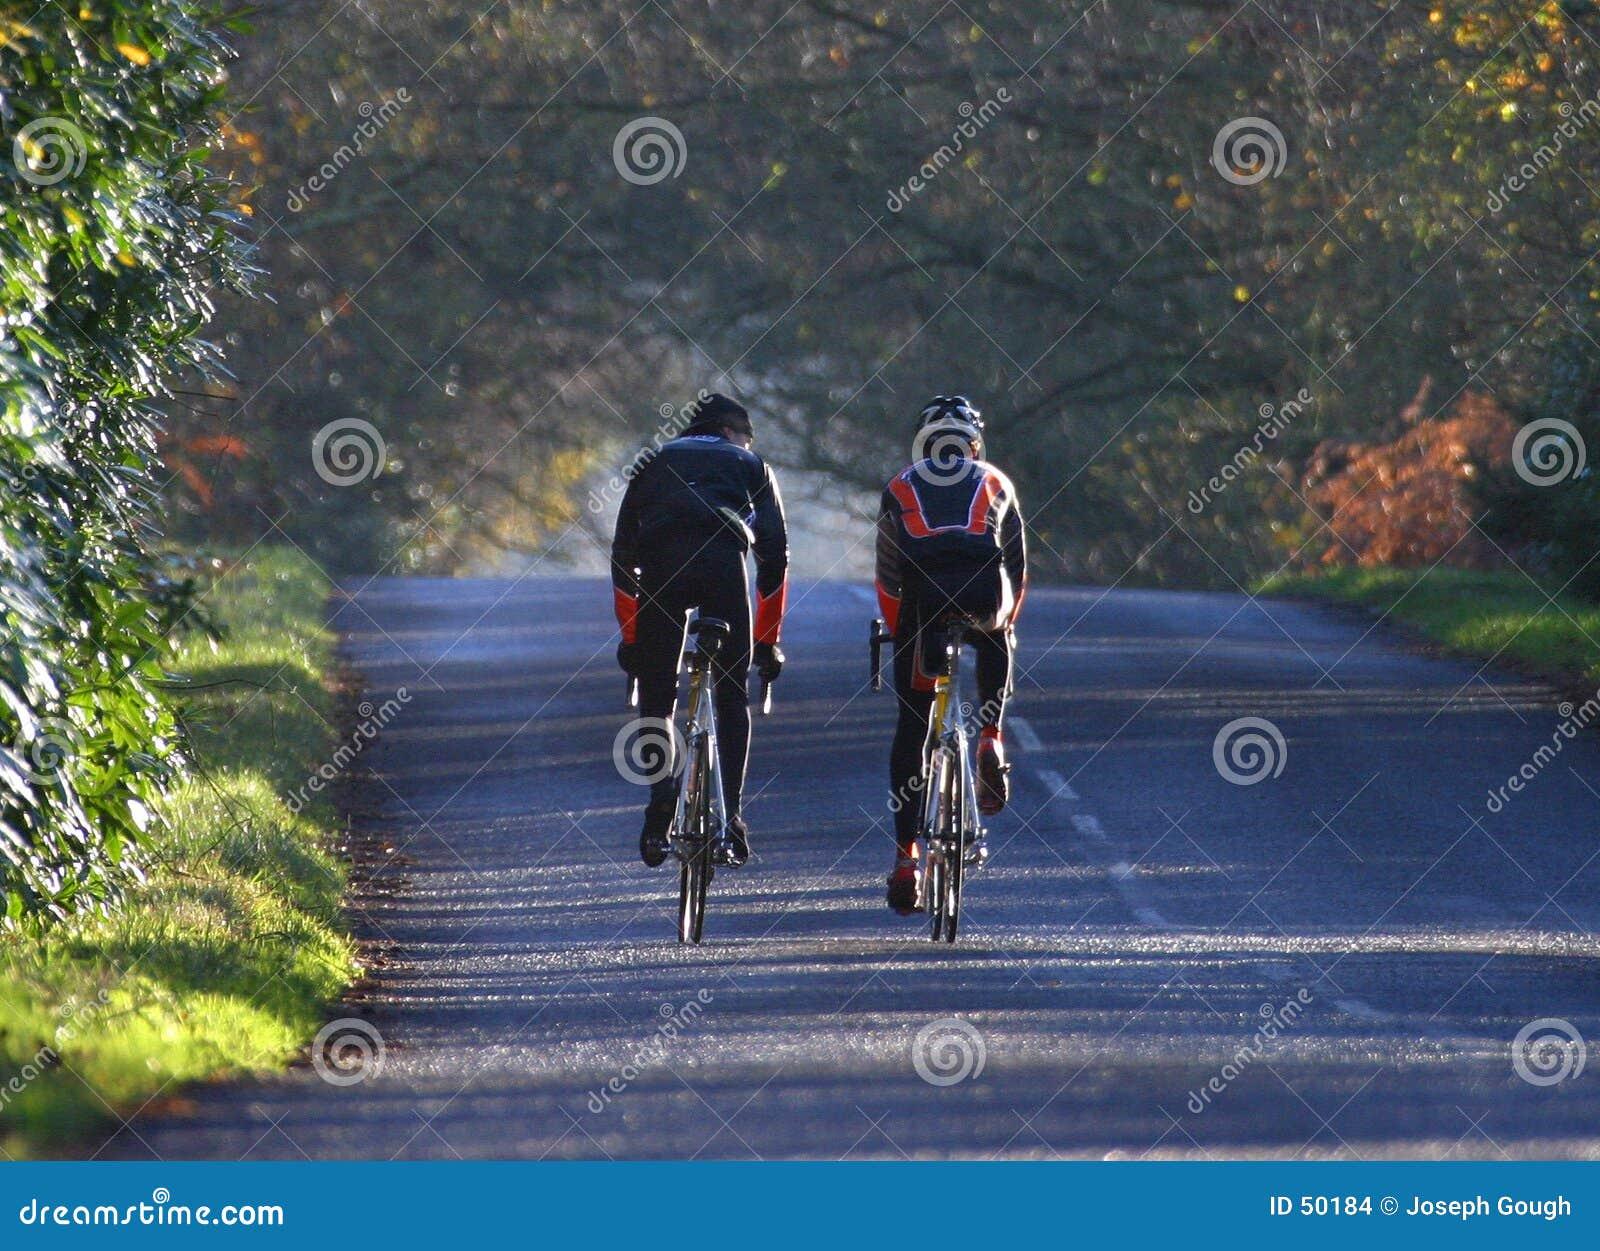 Download αθλητική κατάρτιση γύρου κύκλων Στοκ Εικόνες - εικόνα από άσκηση, οδήγηση: 50184